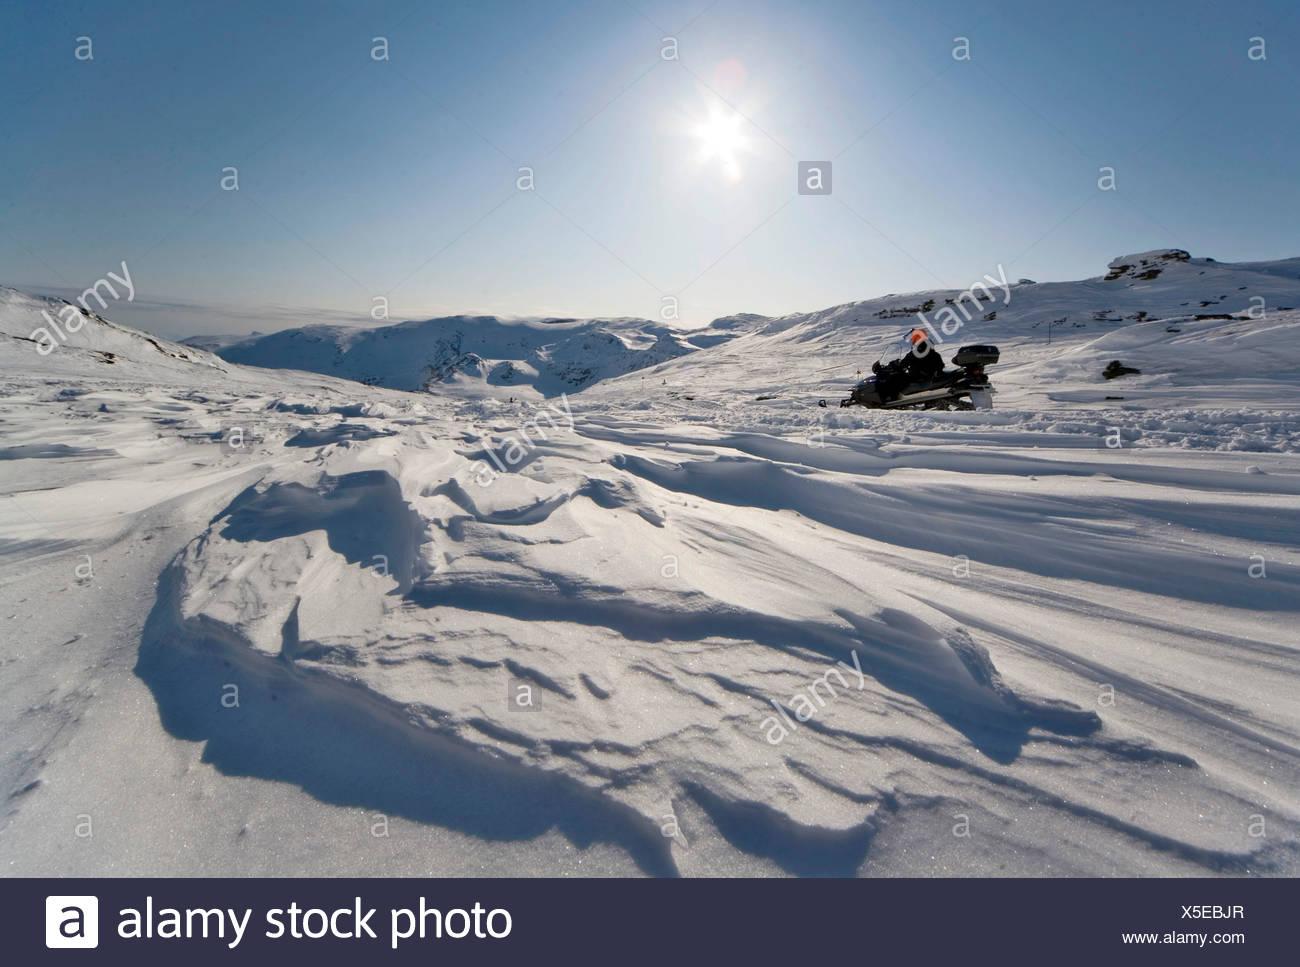 Snowmobile in Riksgrensen in Lapland, Sweden, Scandinavia, Europe - Stock Image